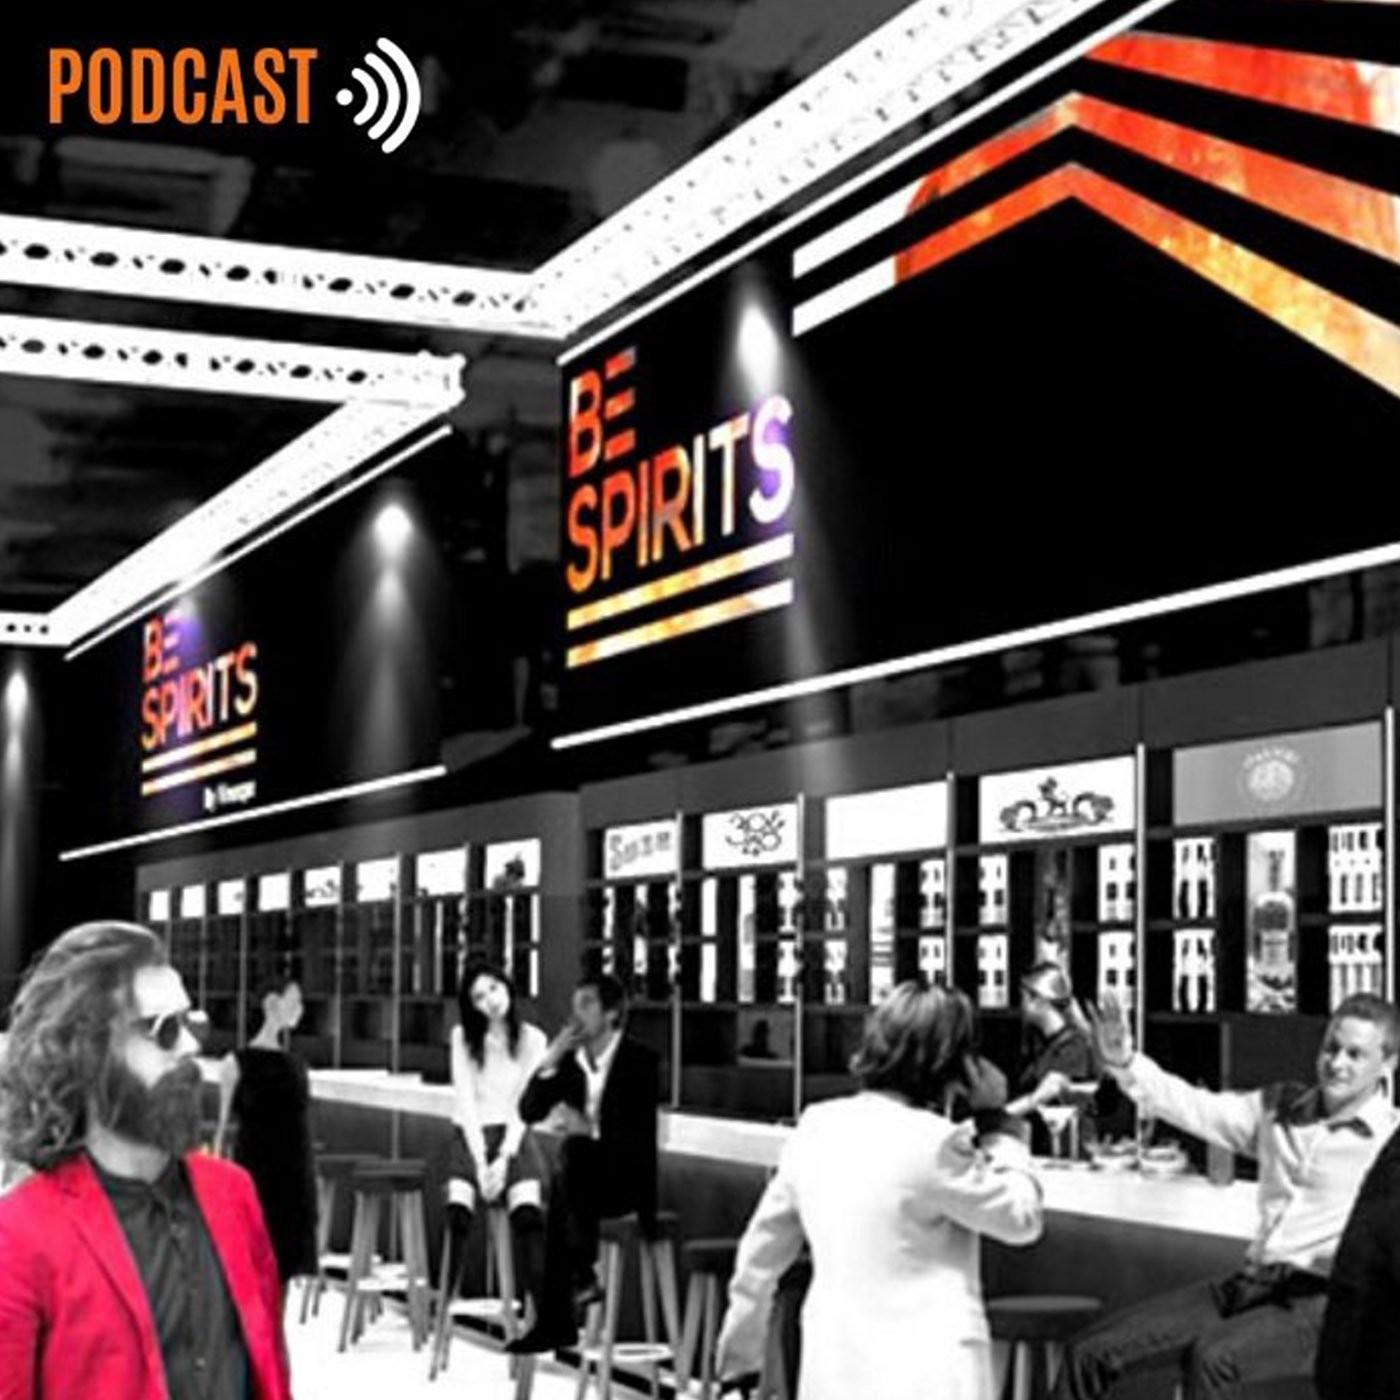 Podcast Infosbar Inside #25 - Be Spirits by Vinexpo Paris - Part 4